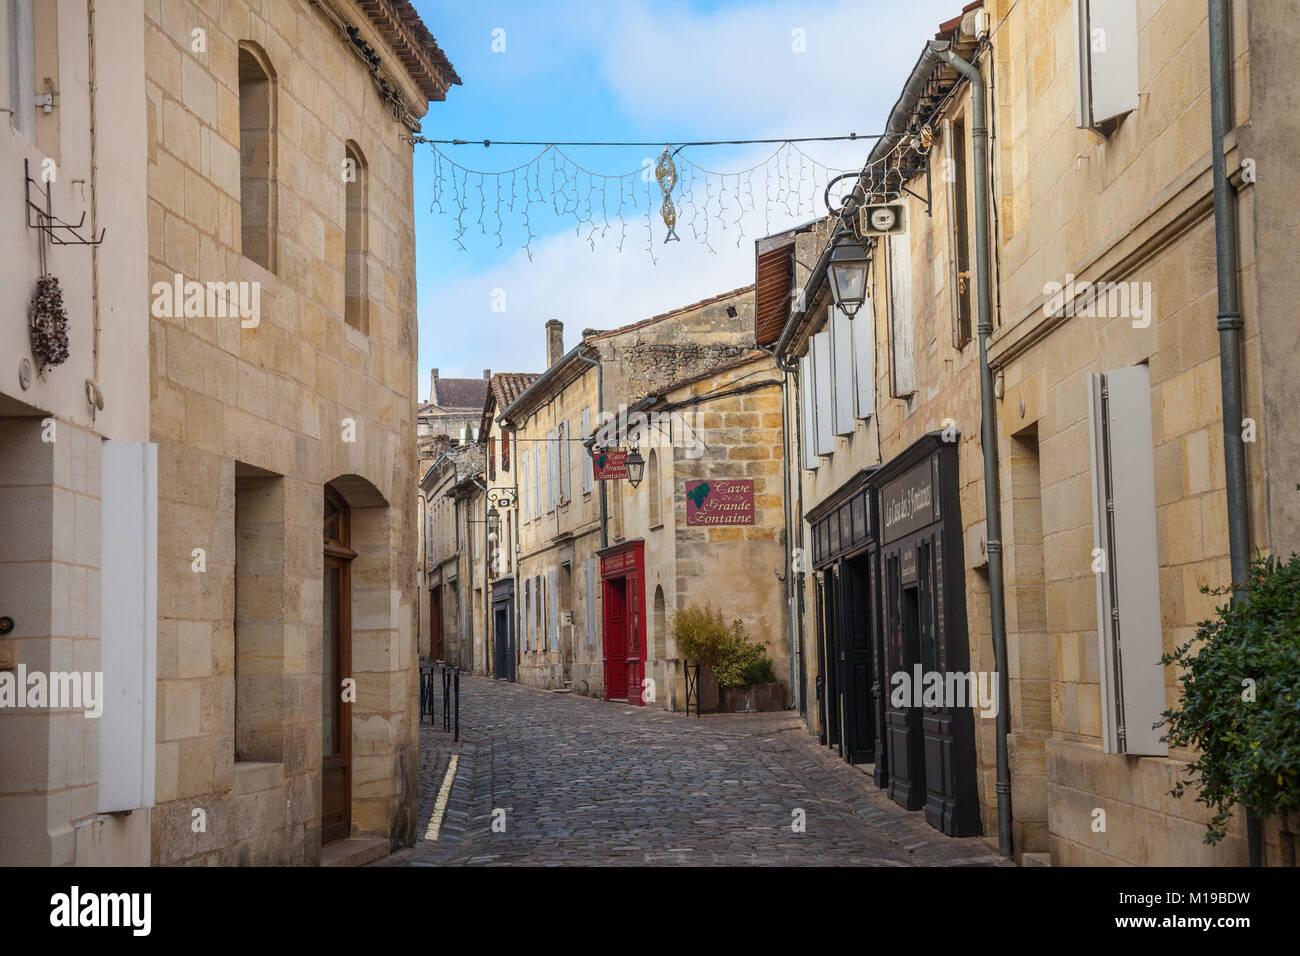 SAINT EMILION, FRANCE - DECEMBER 25, 2017: Main street of the medieval city of Saint Emilion. Wine shops can be - Stock Image